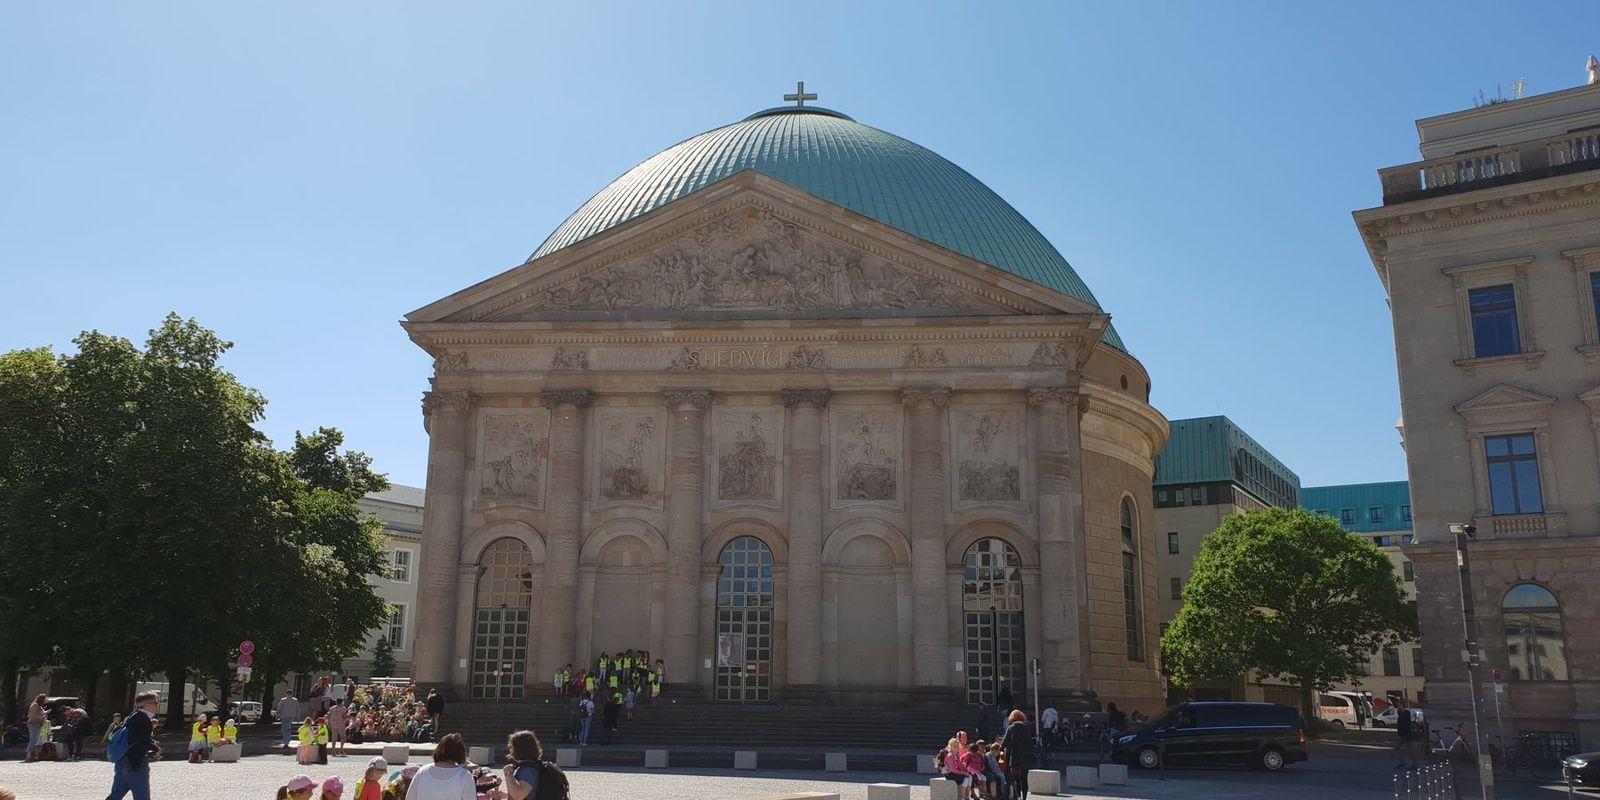 St. Hedwigs Kathedrale in Berlin